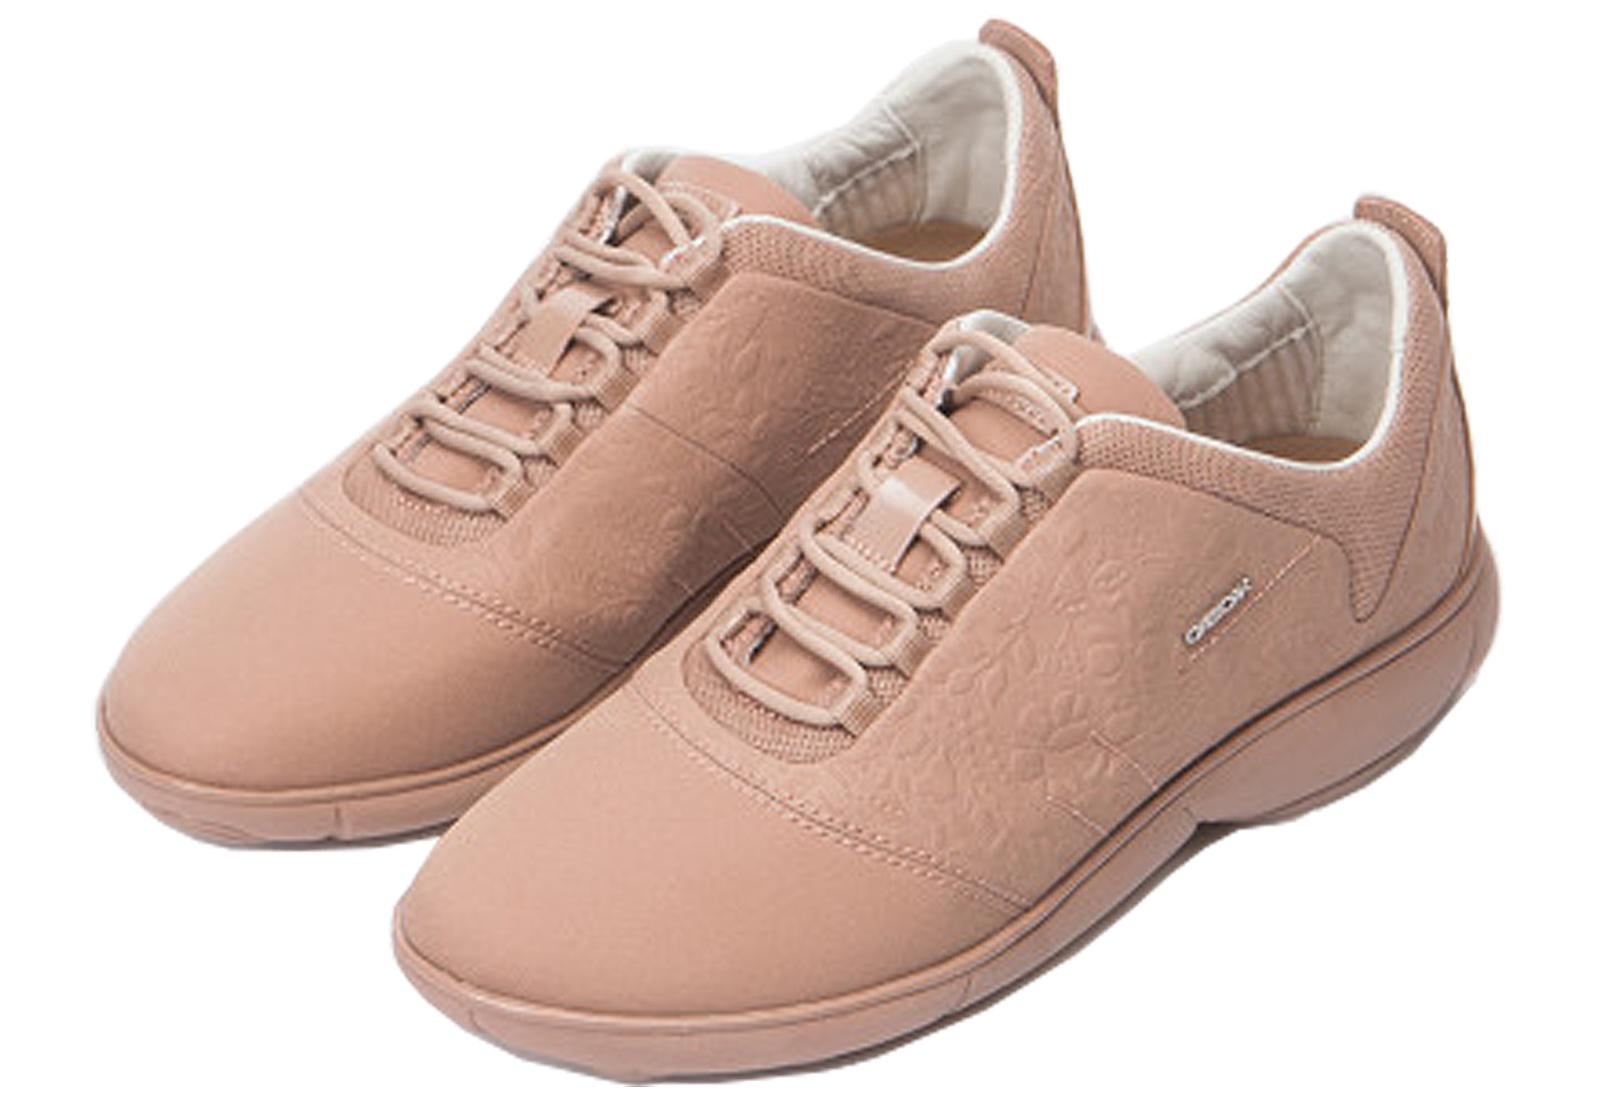 Geox Casual Bež Patike Nebula Office Shoes Srbija